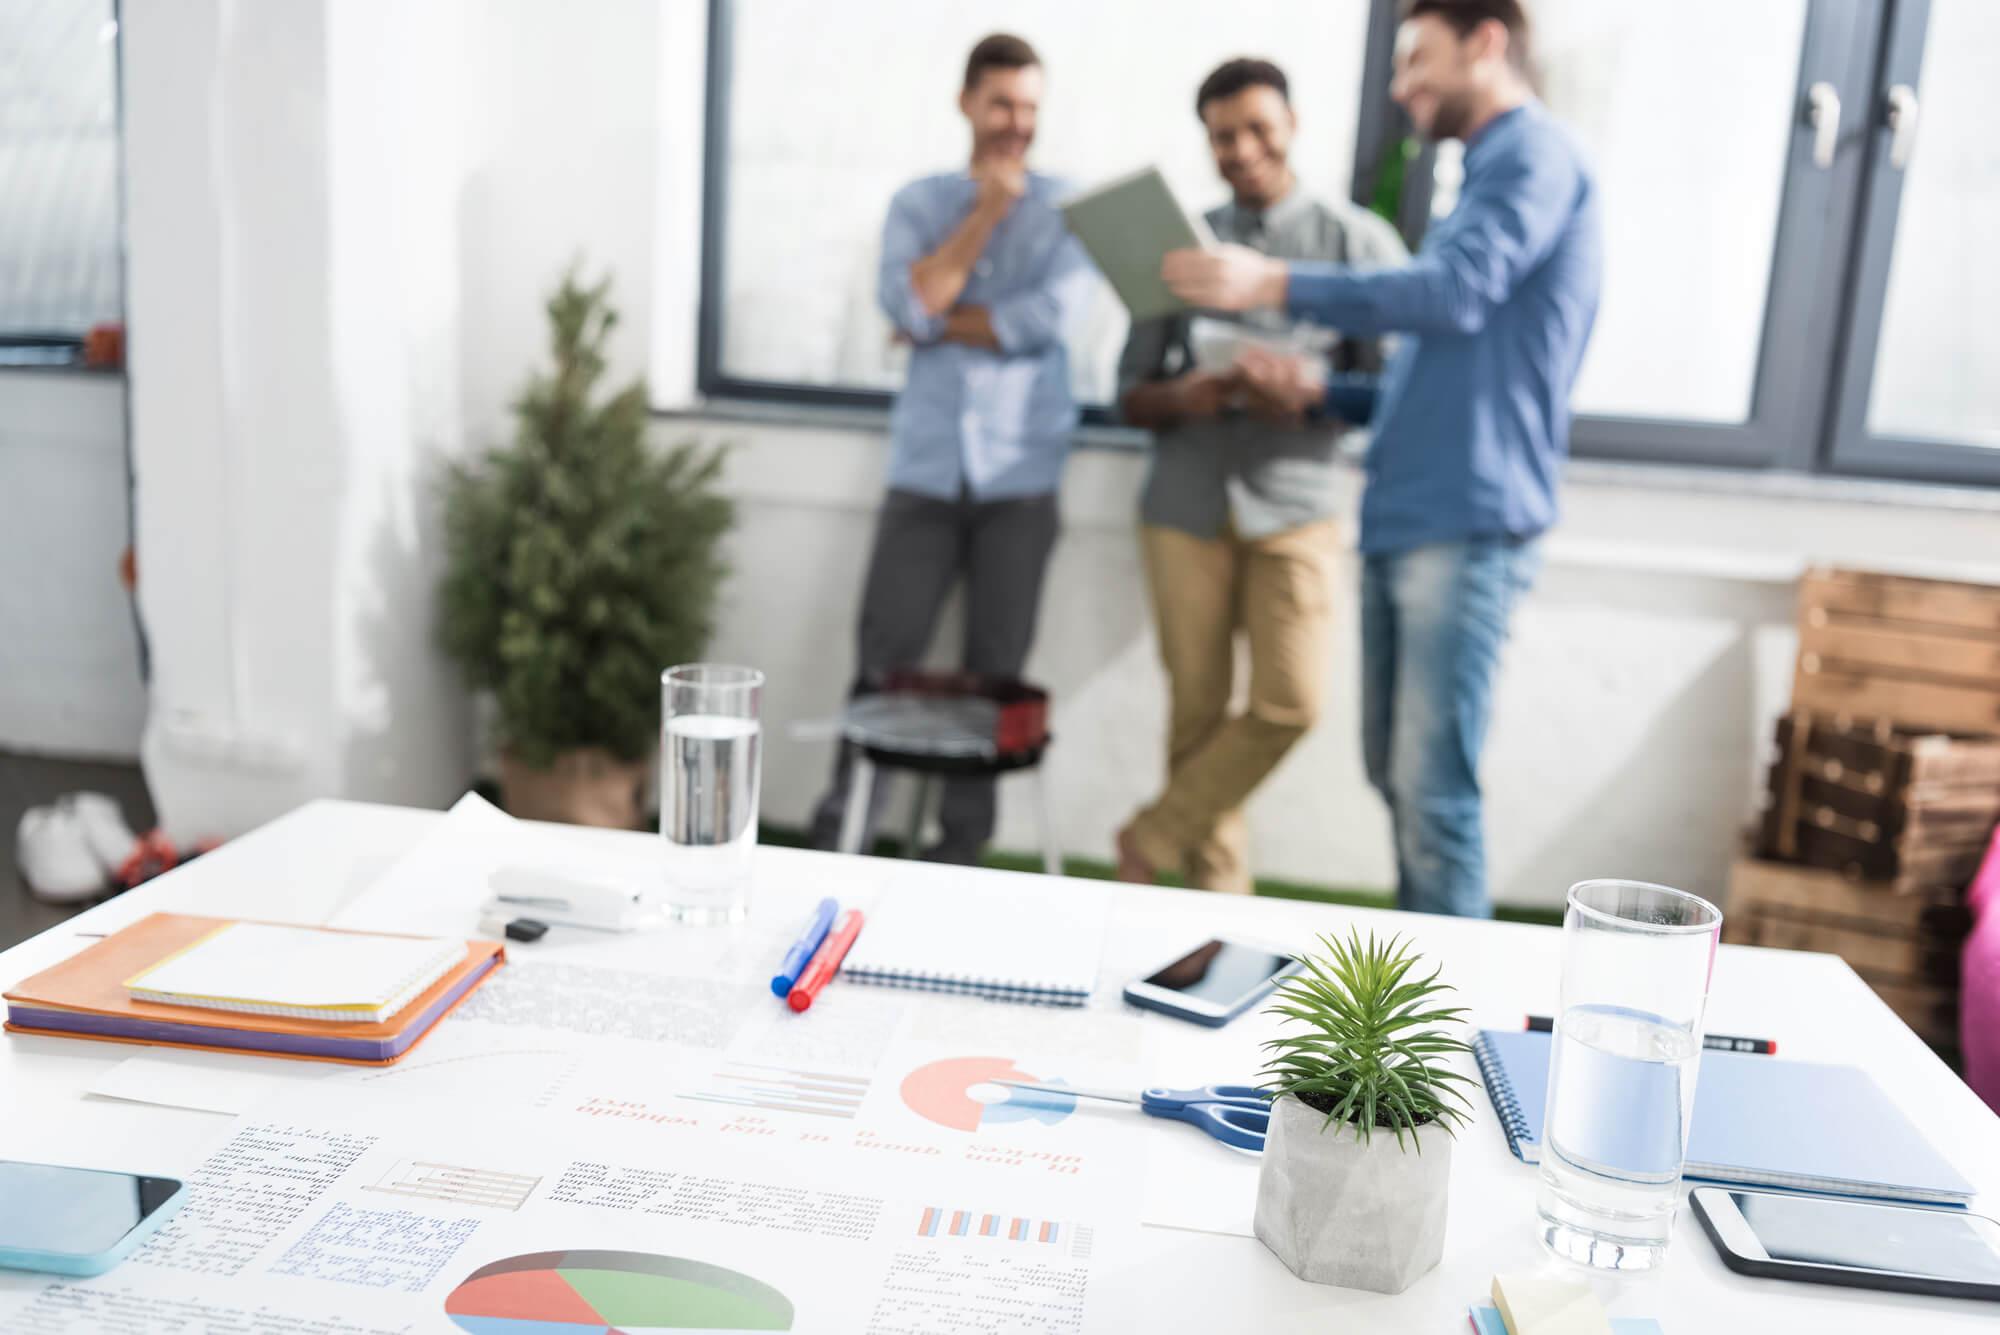 Fluxo de caixa para startups: saiba como fazer de forma eficiente